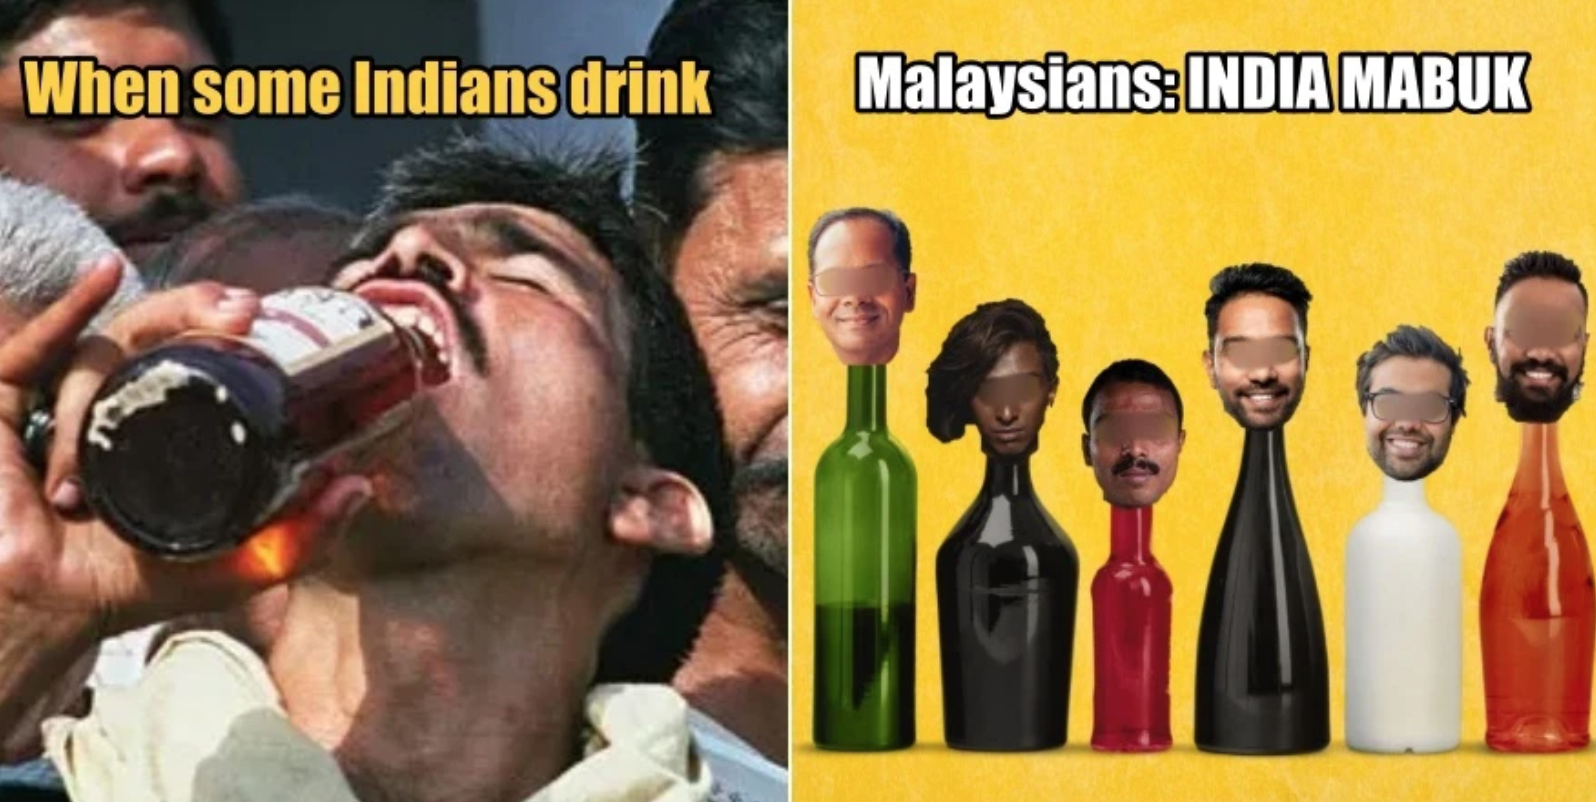 The Myth of the Drunk Minority